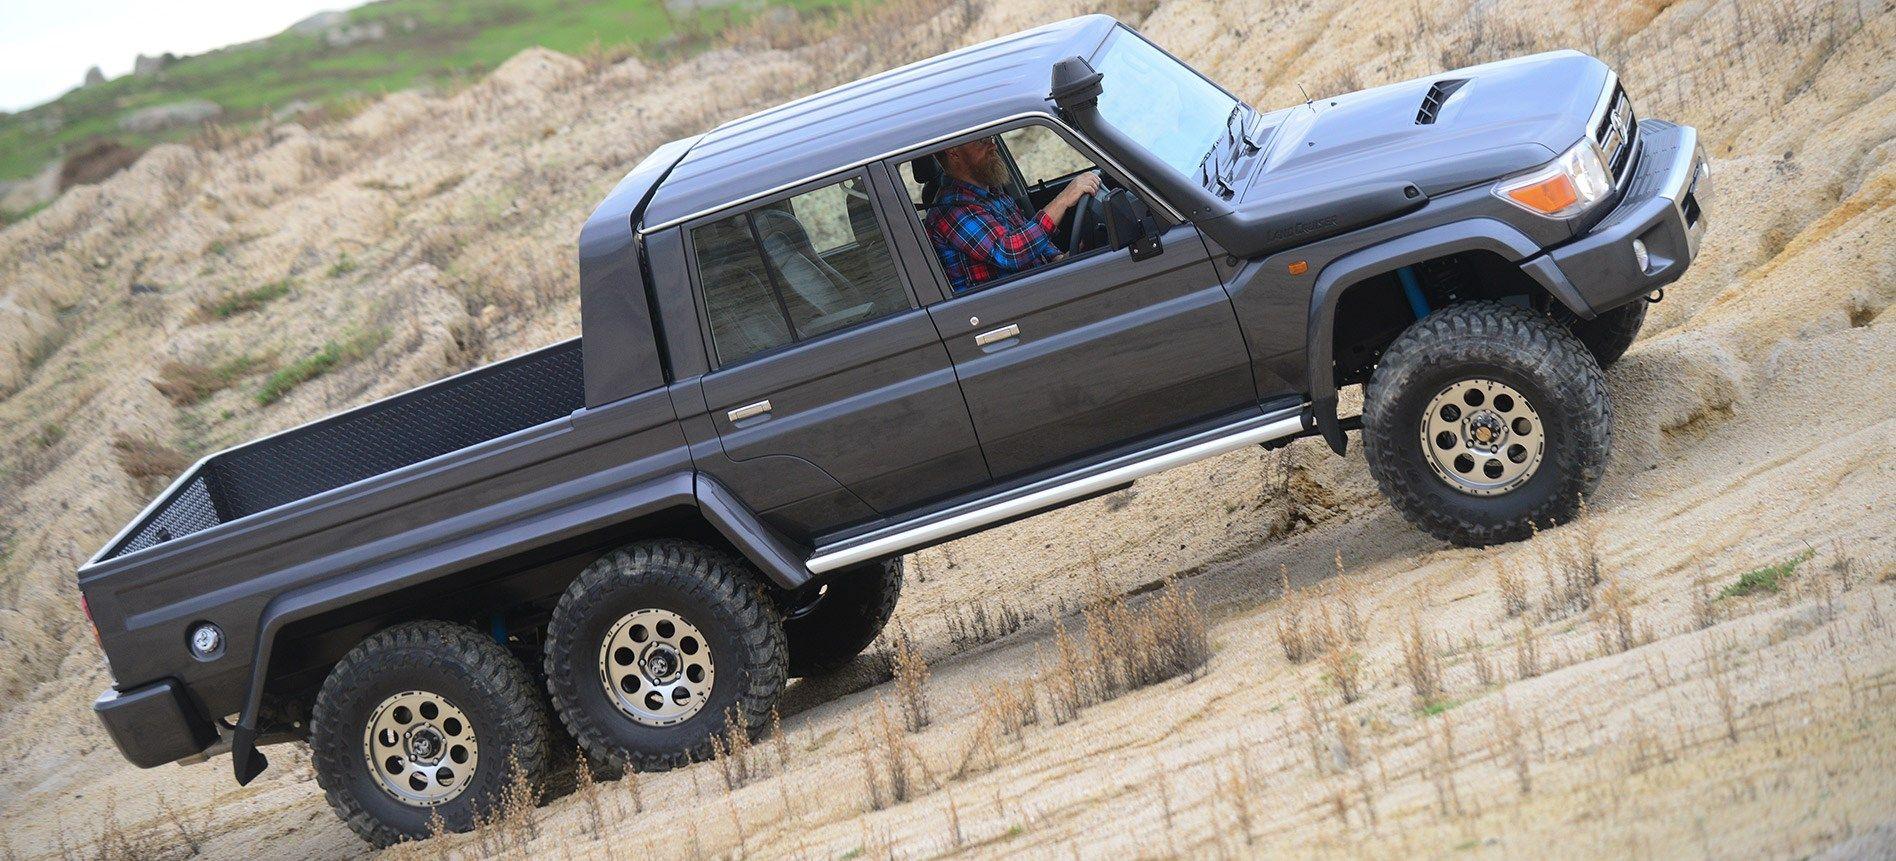 Kelebihan Toyota 6X6 Top Model Tahun Ini